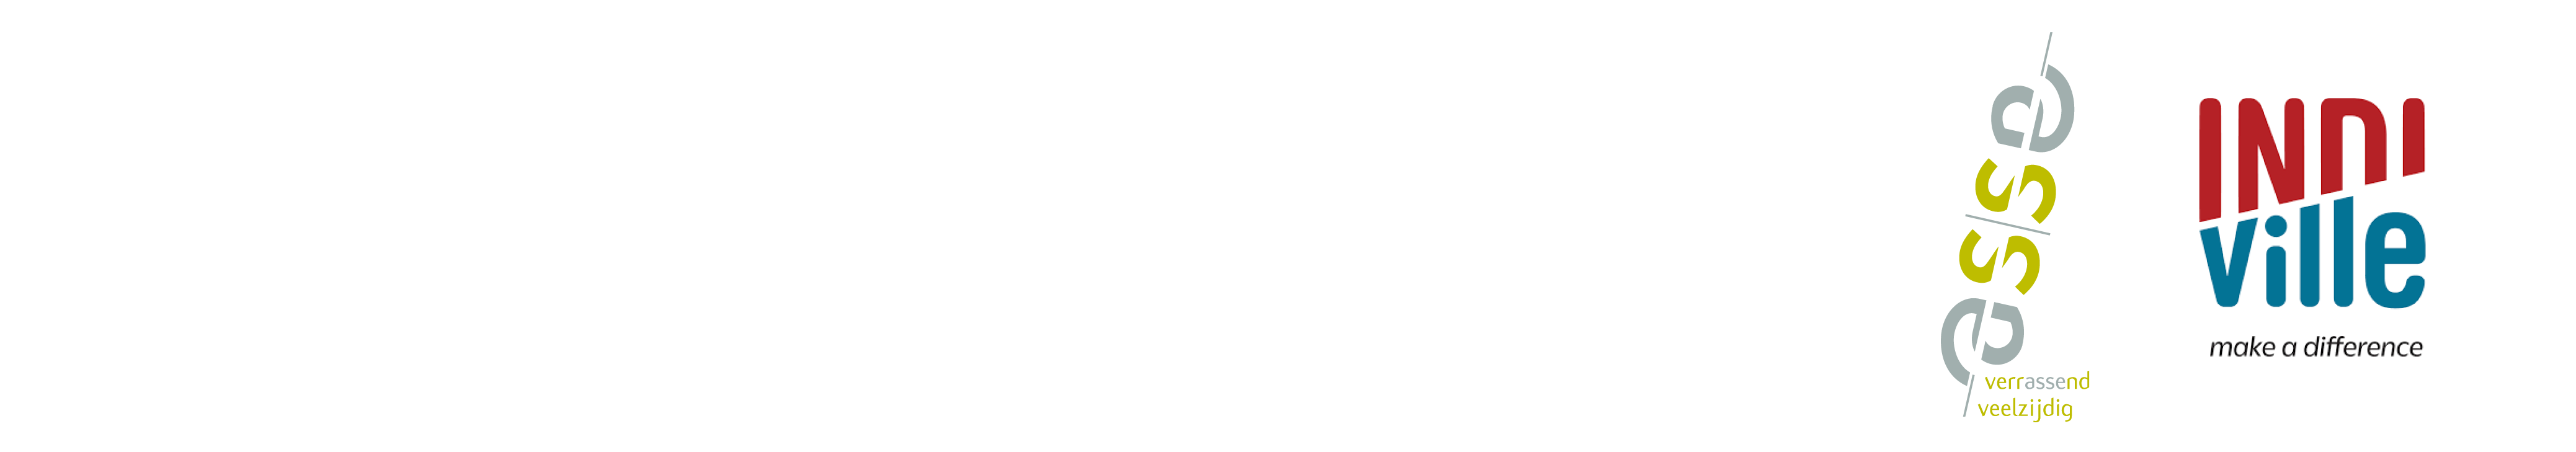 Logo Asse - Indiville